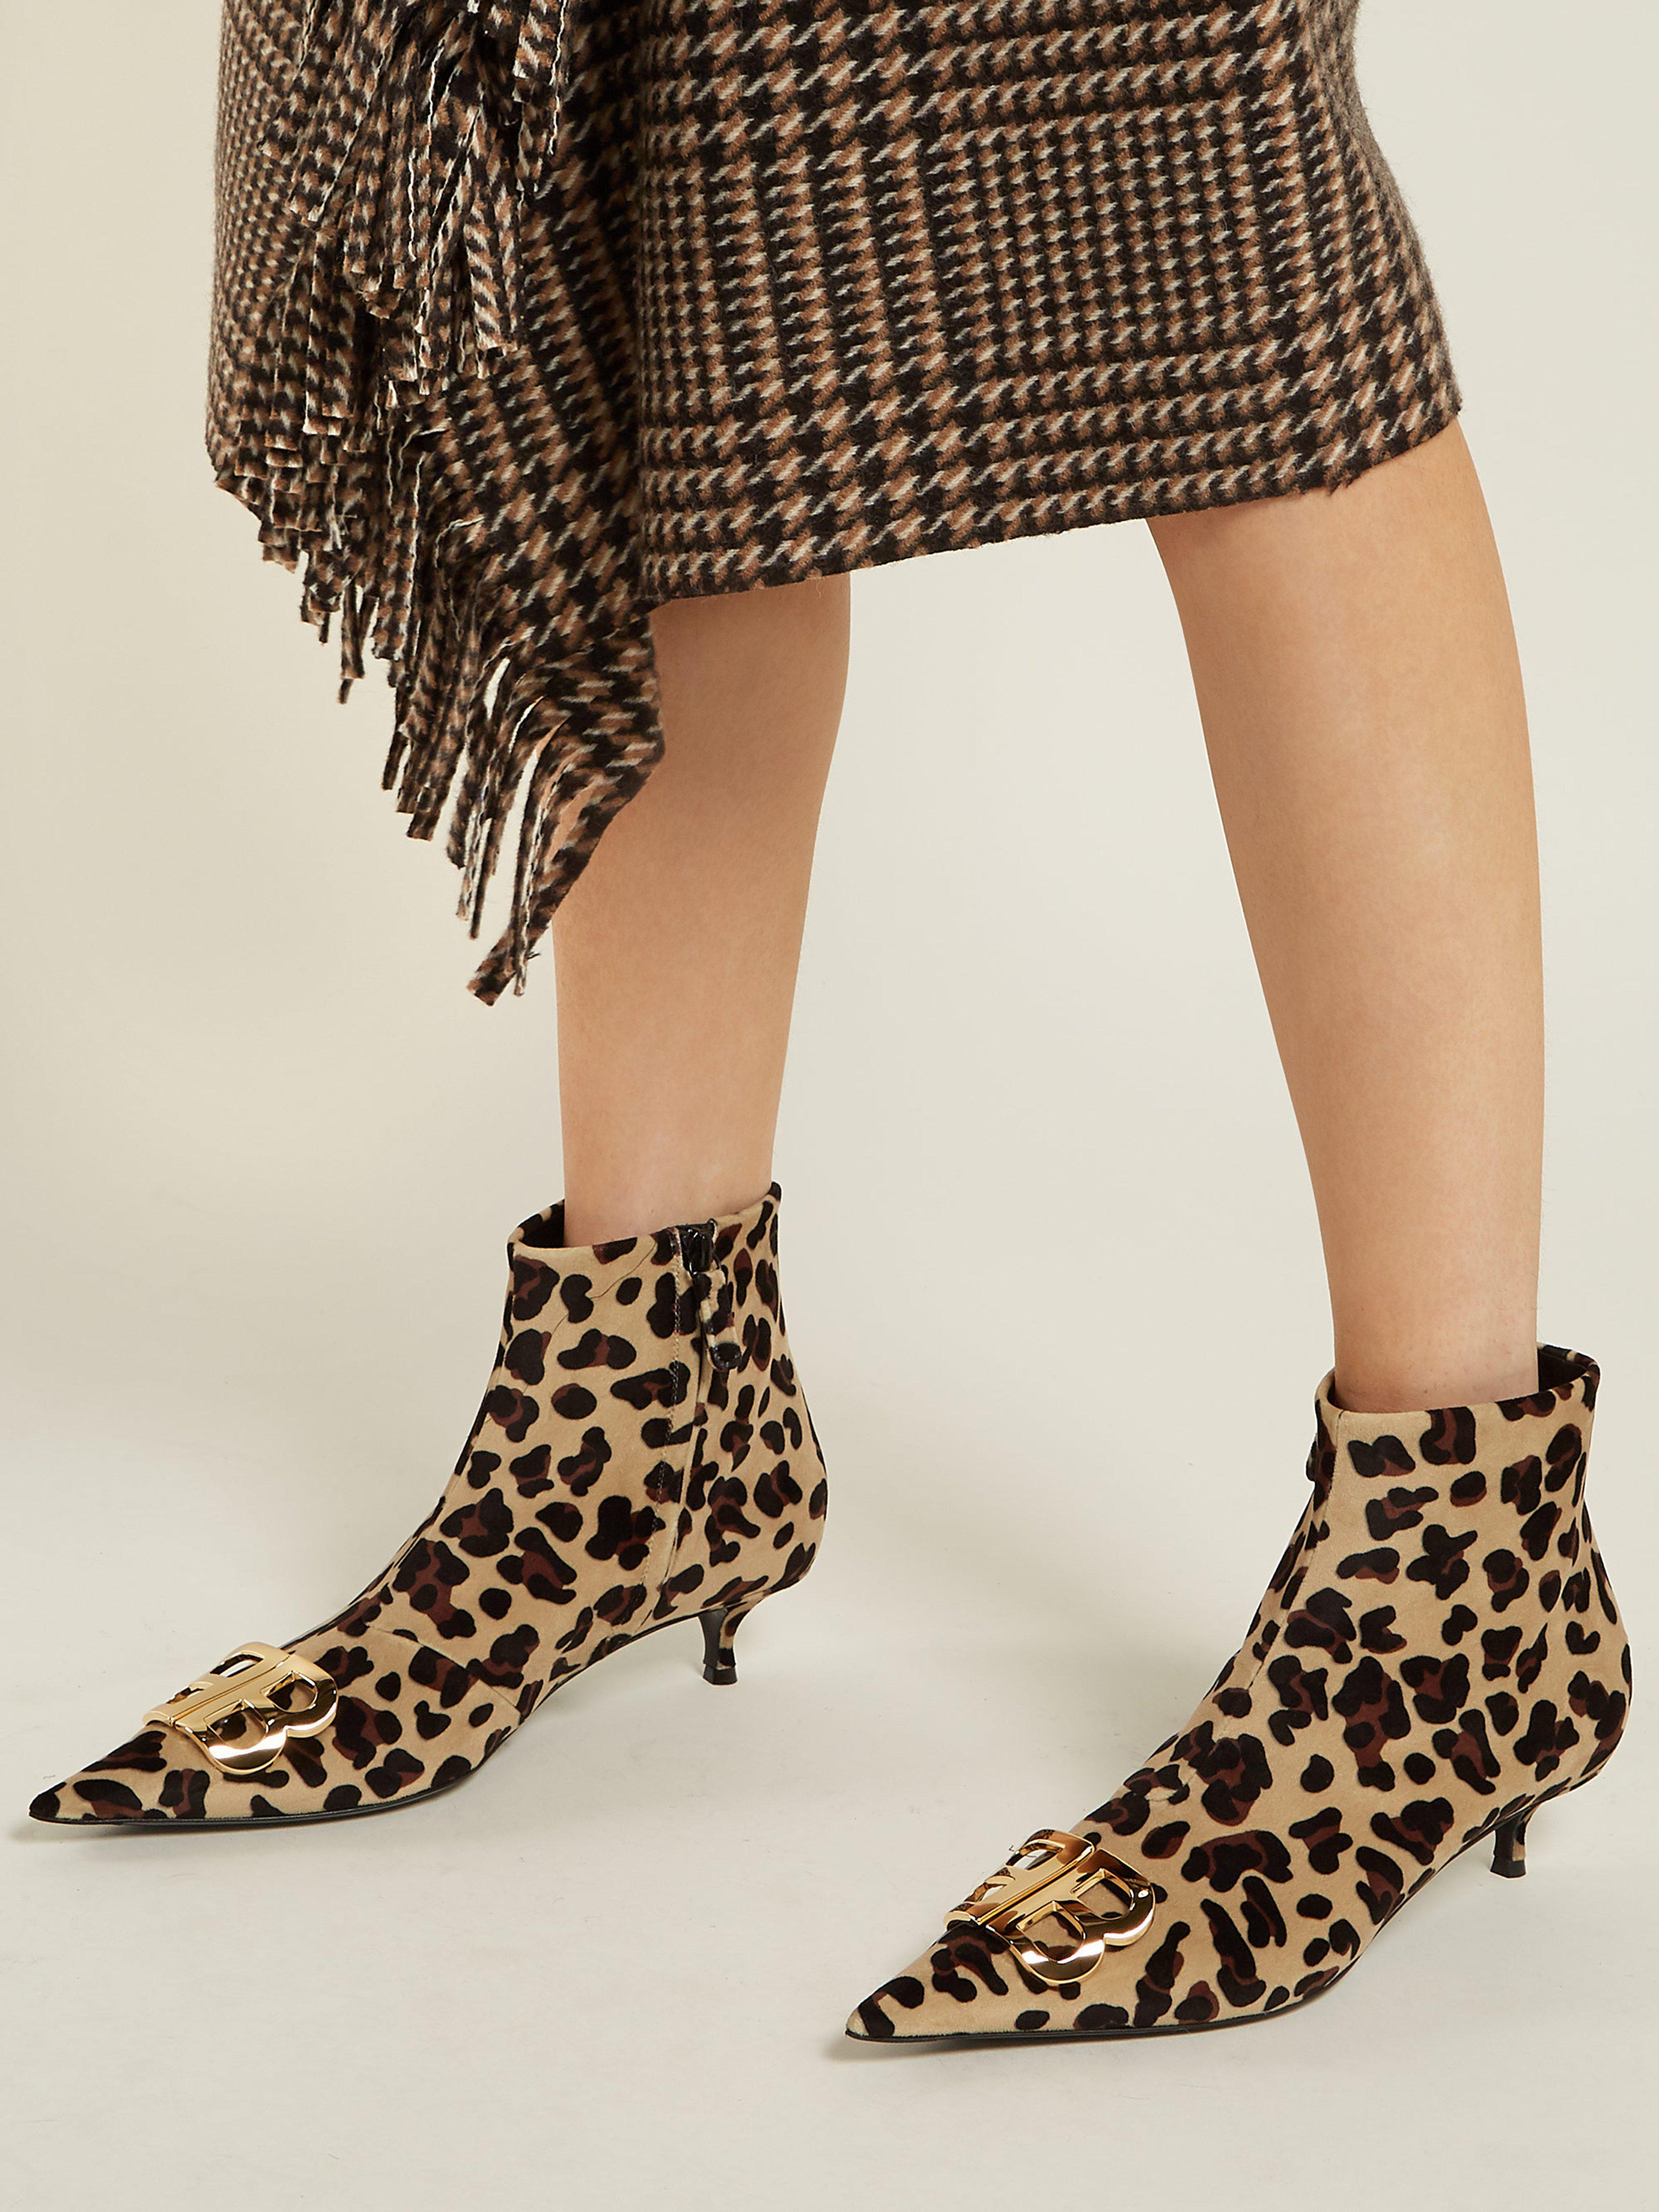 9a35d917ce63 Balenciaga - Brown Leopard Velvet Bb Ankle Boots - Lyst. View fullscreen